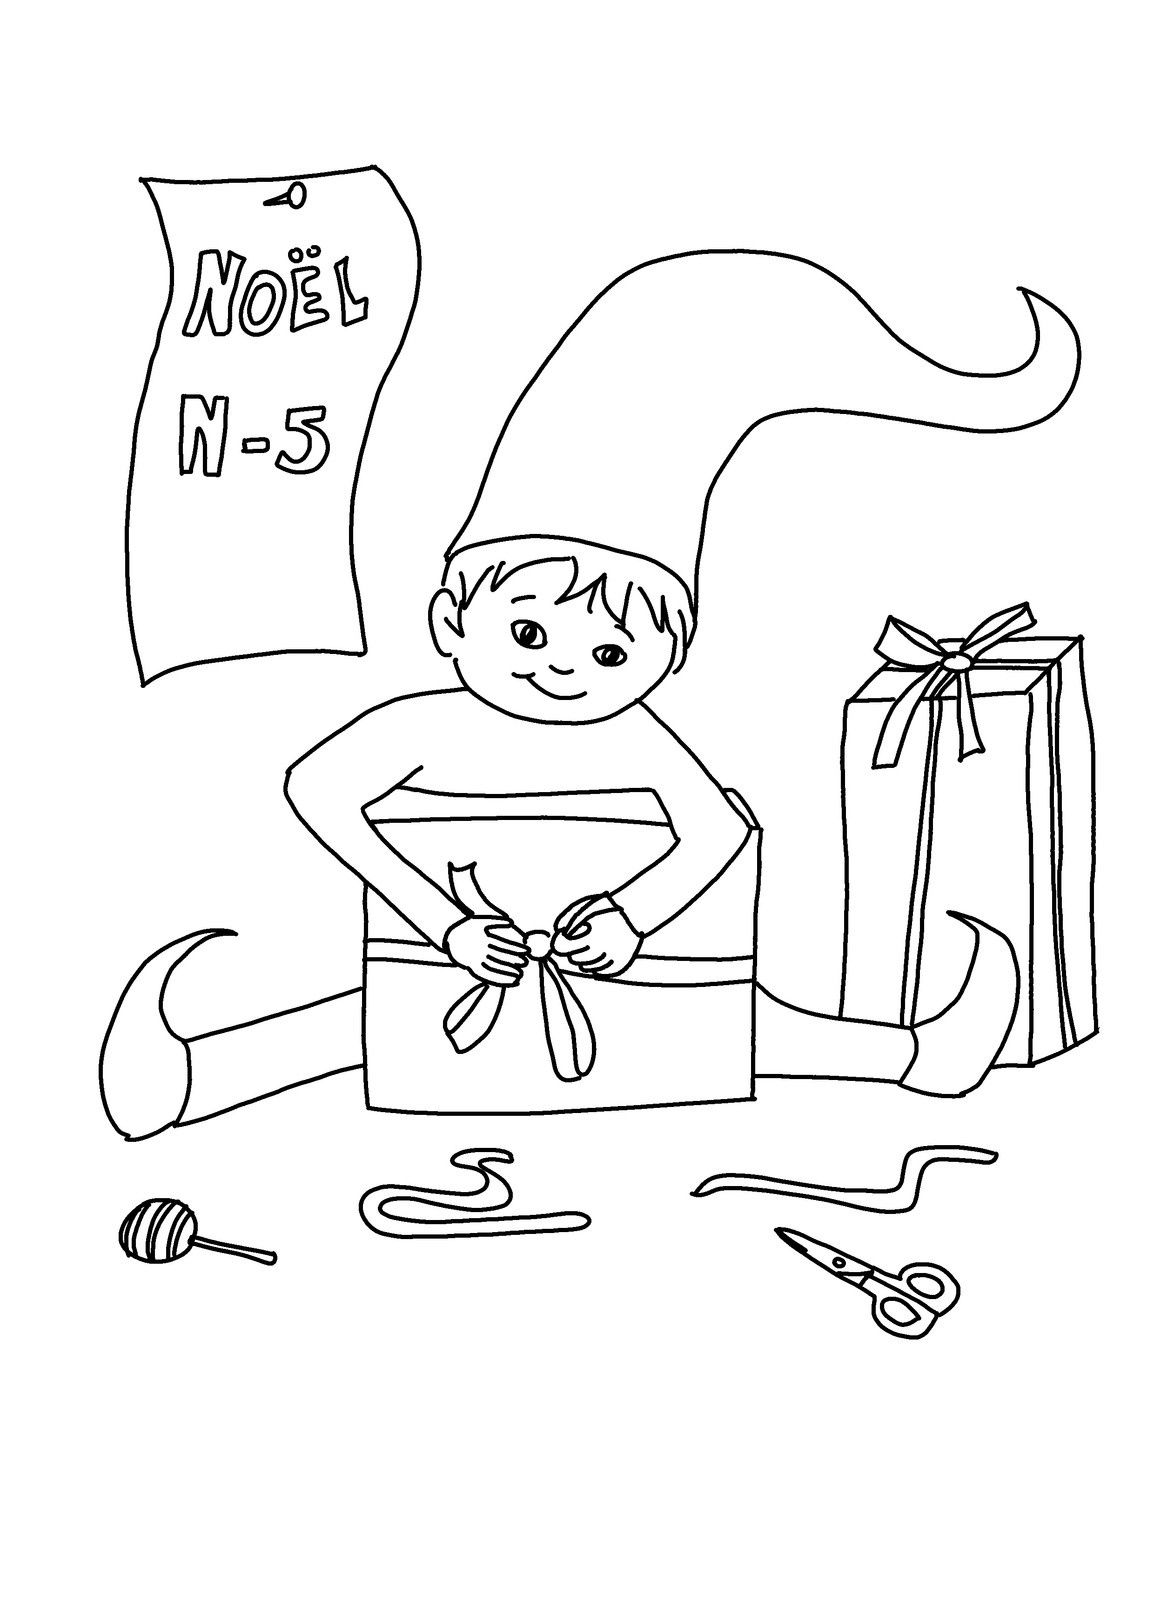 N-5 (Noël arrive)